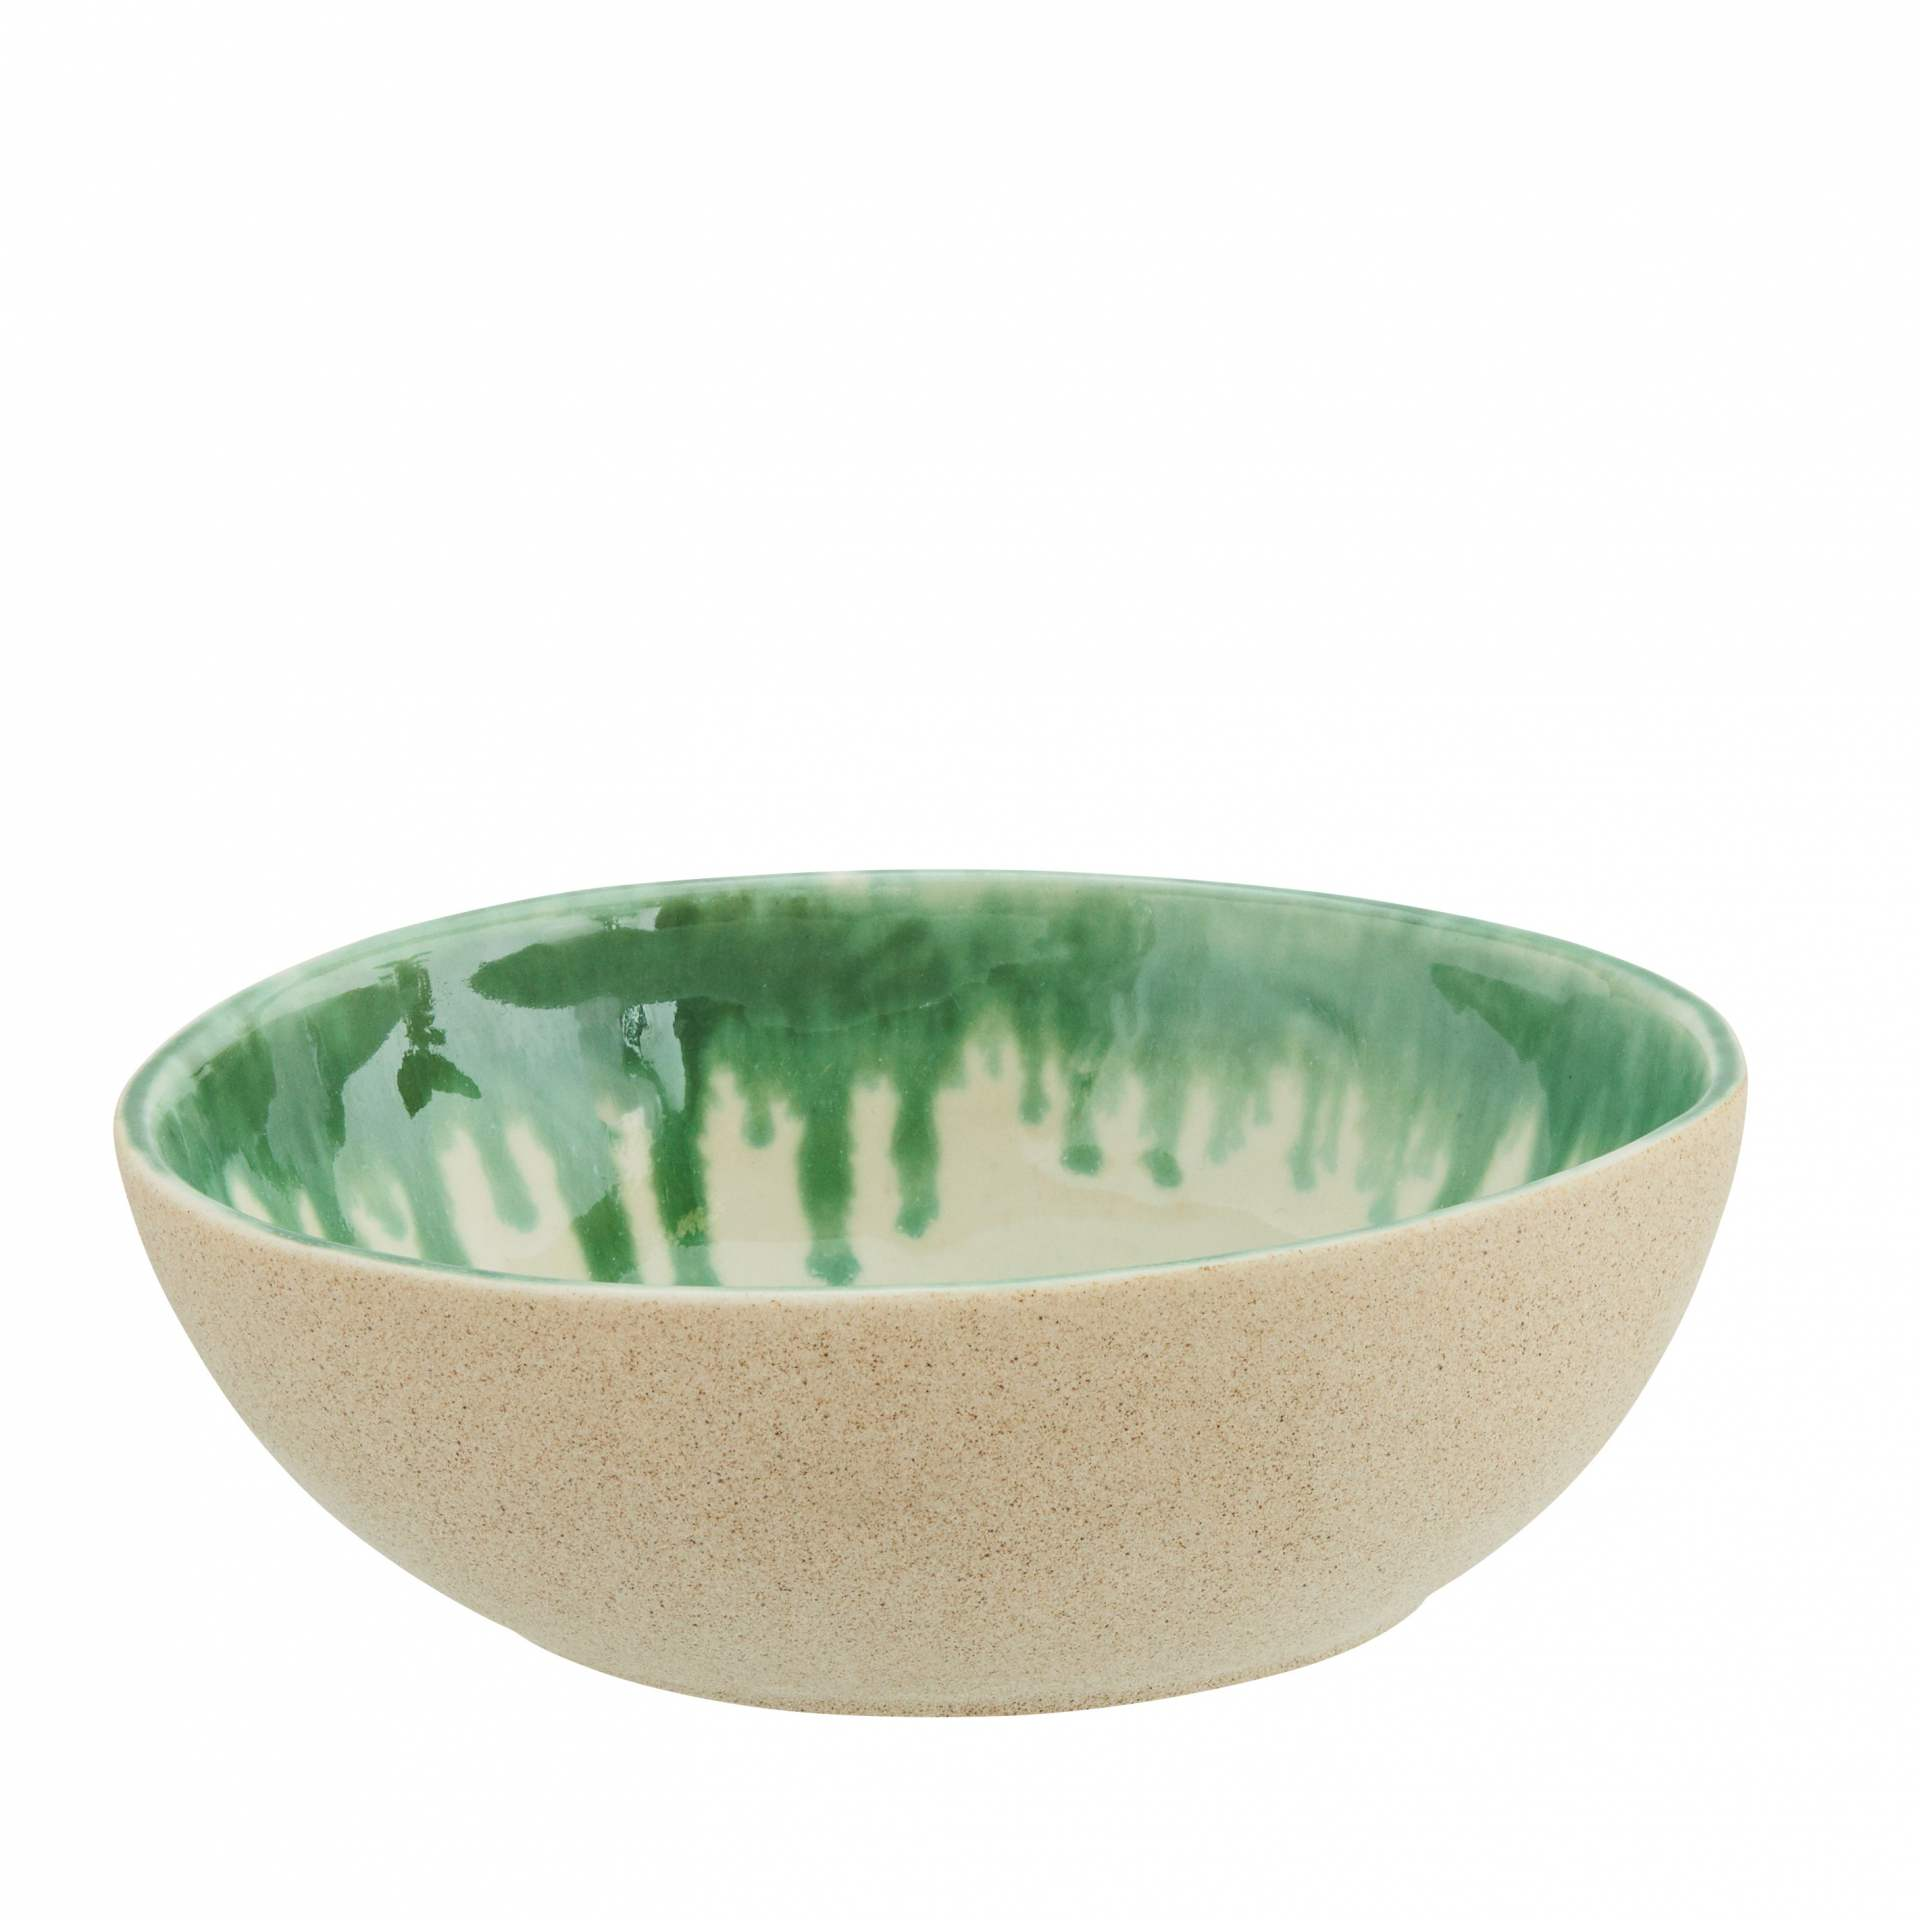 MADAM STOLTZ Kameninová miska Oval, zelená barva, bílá barva